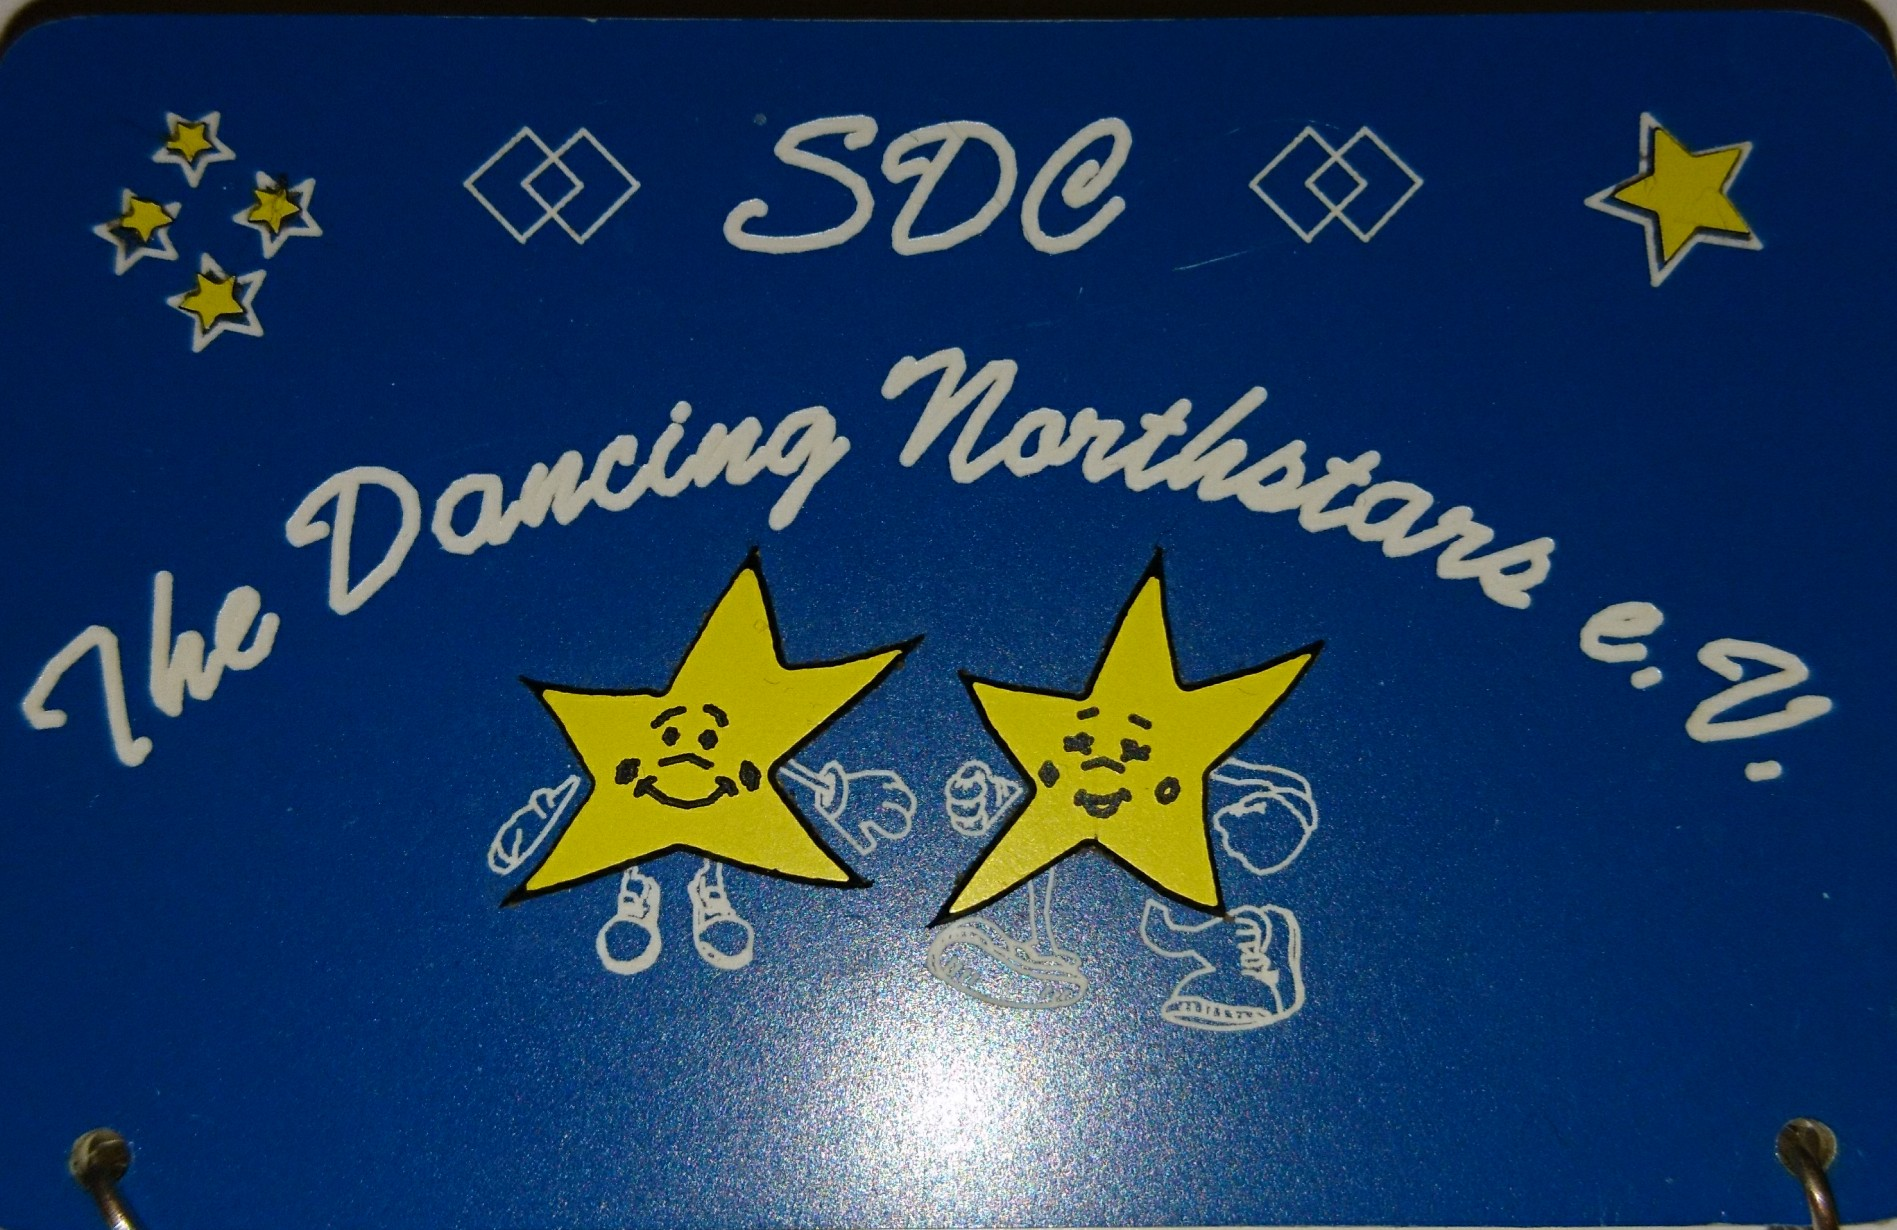 Logo Dancing Northstars e.V. Flensburg macht Spass